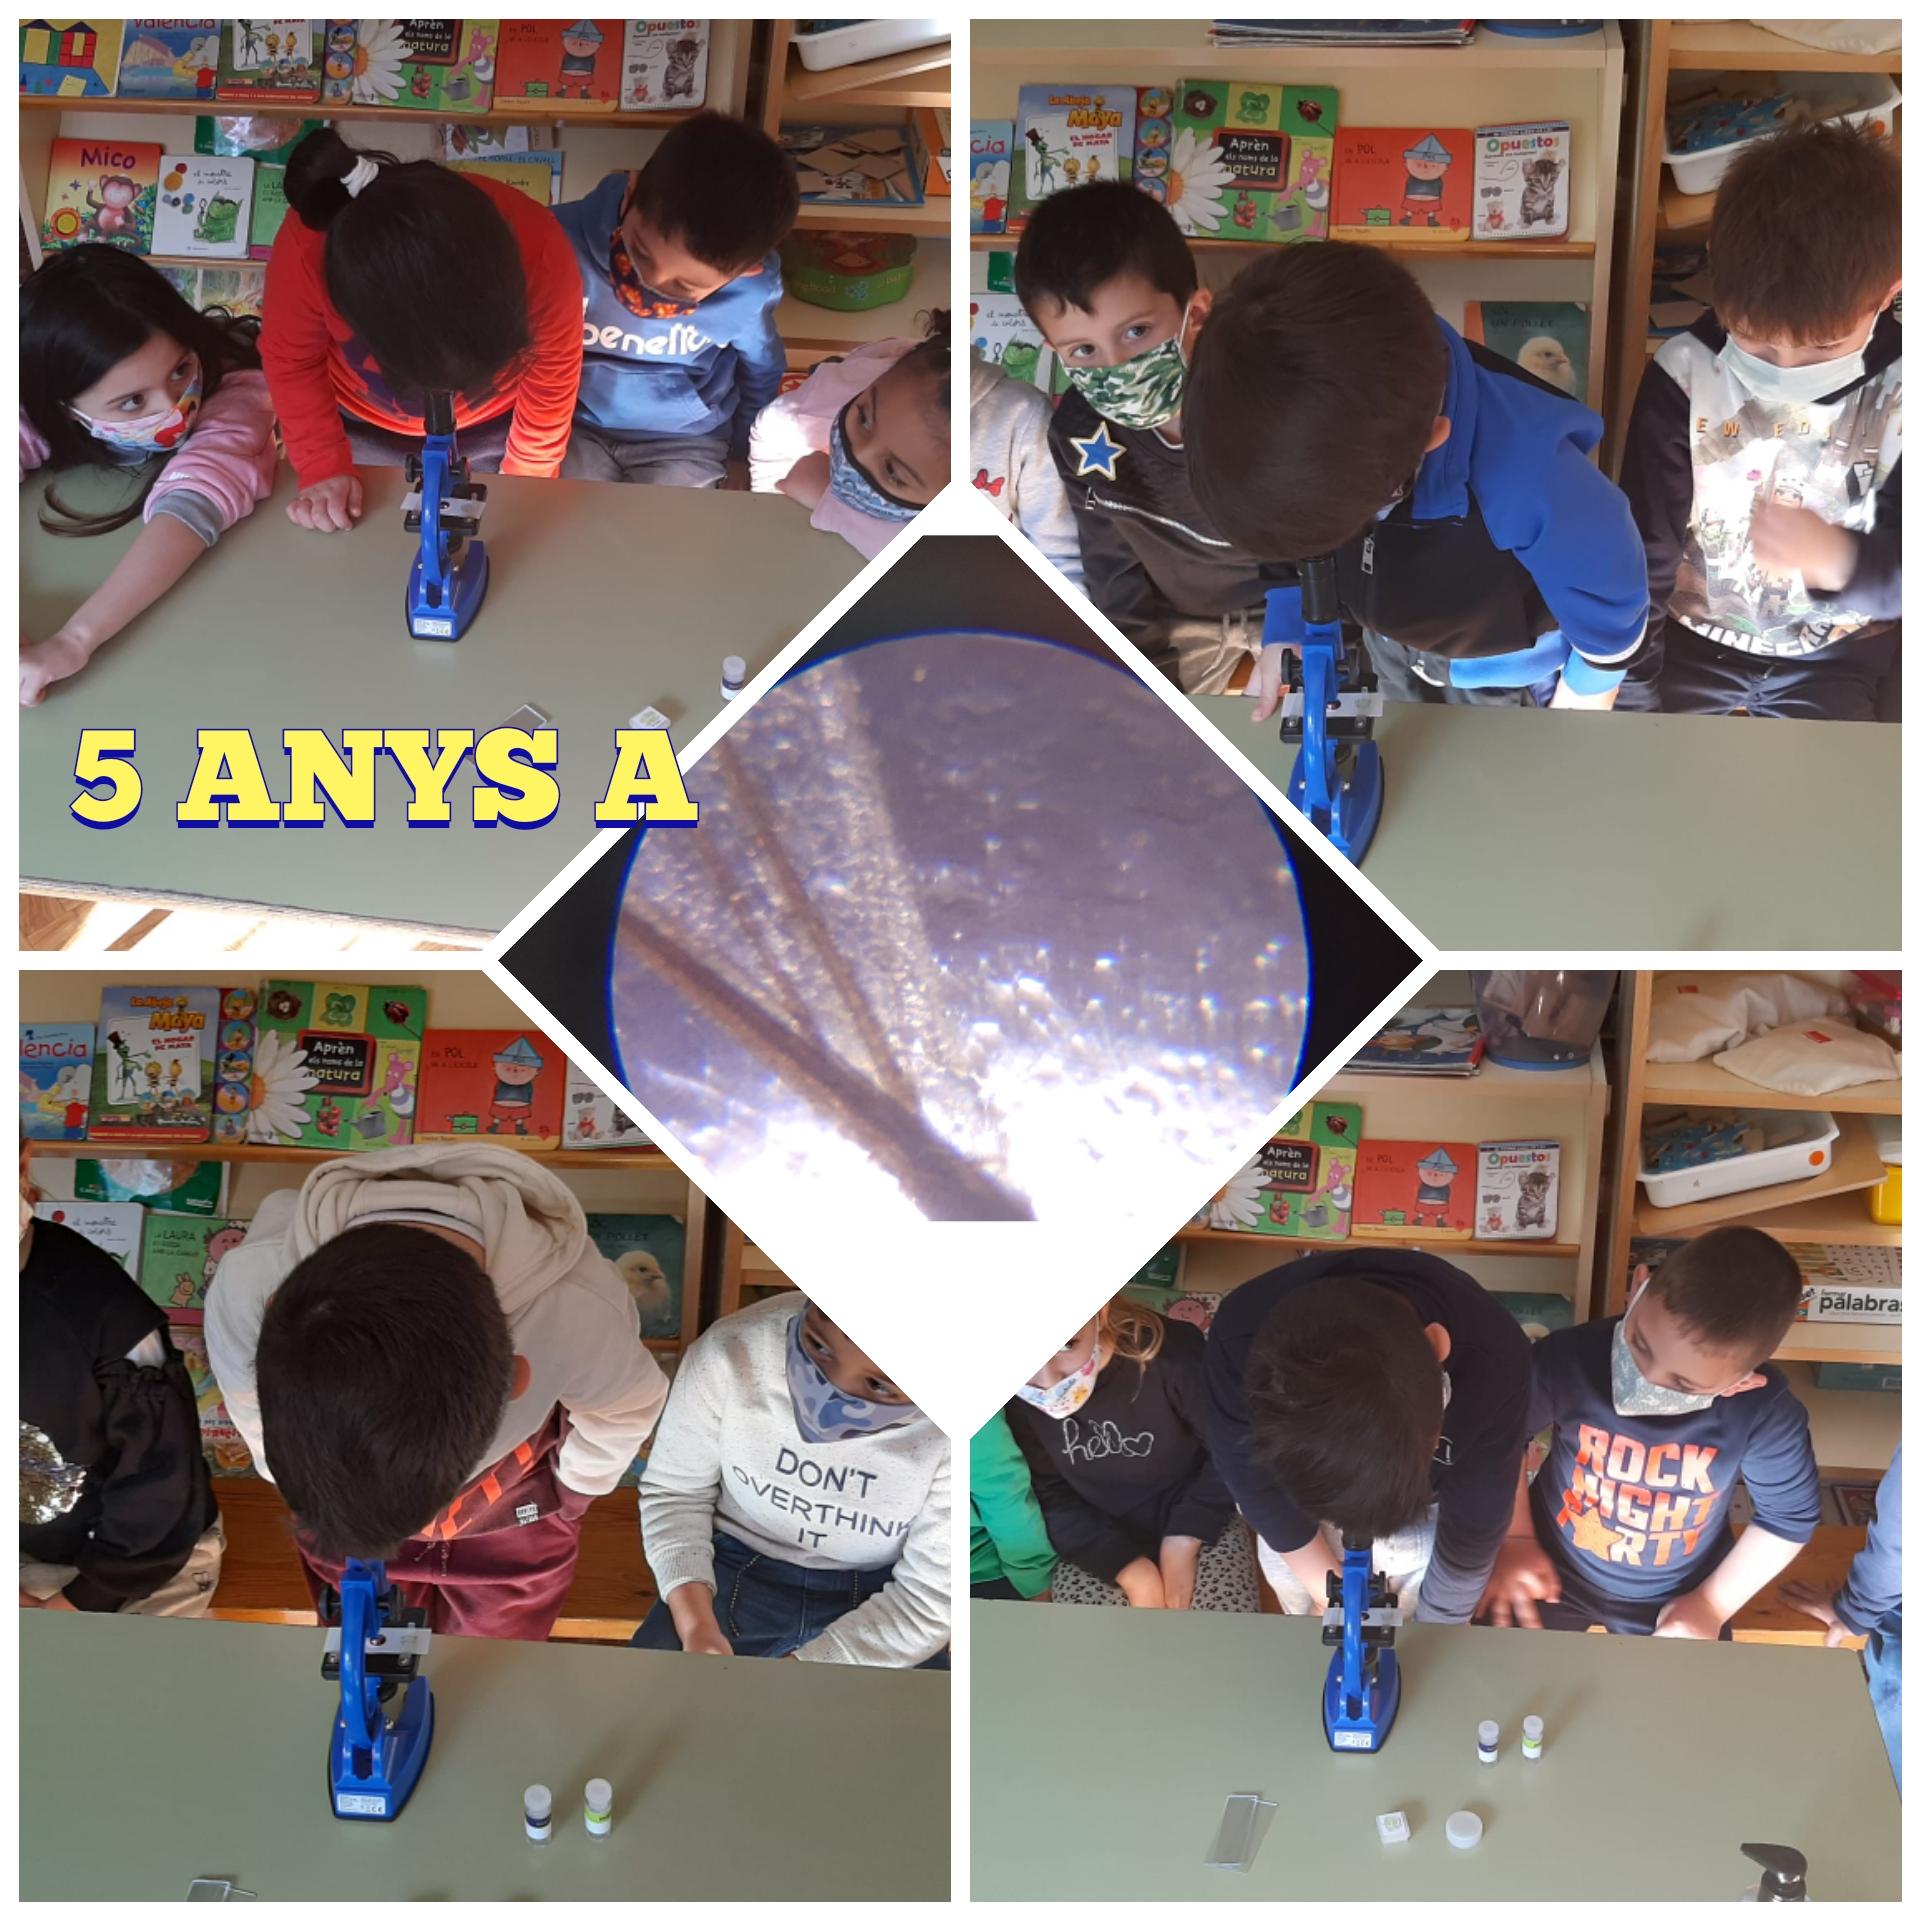 5-ANYS-A-2